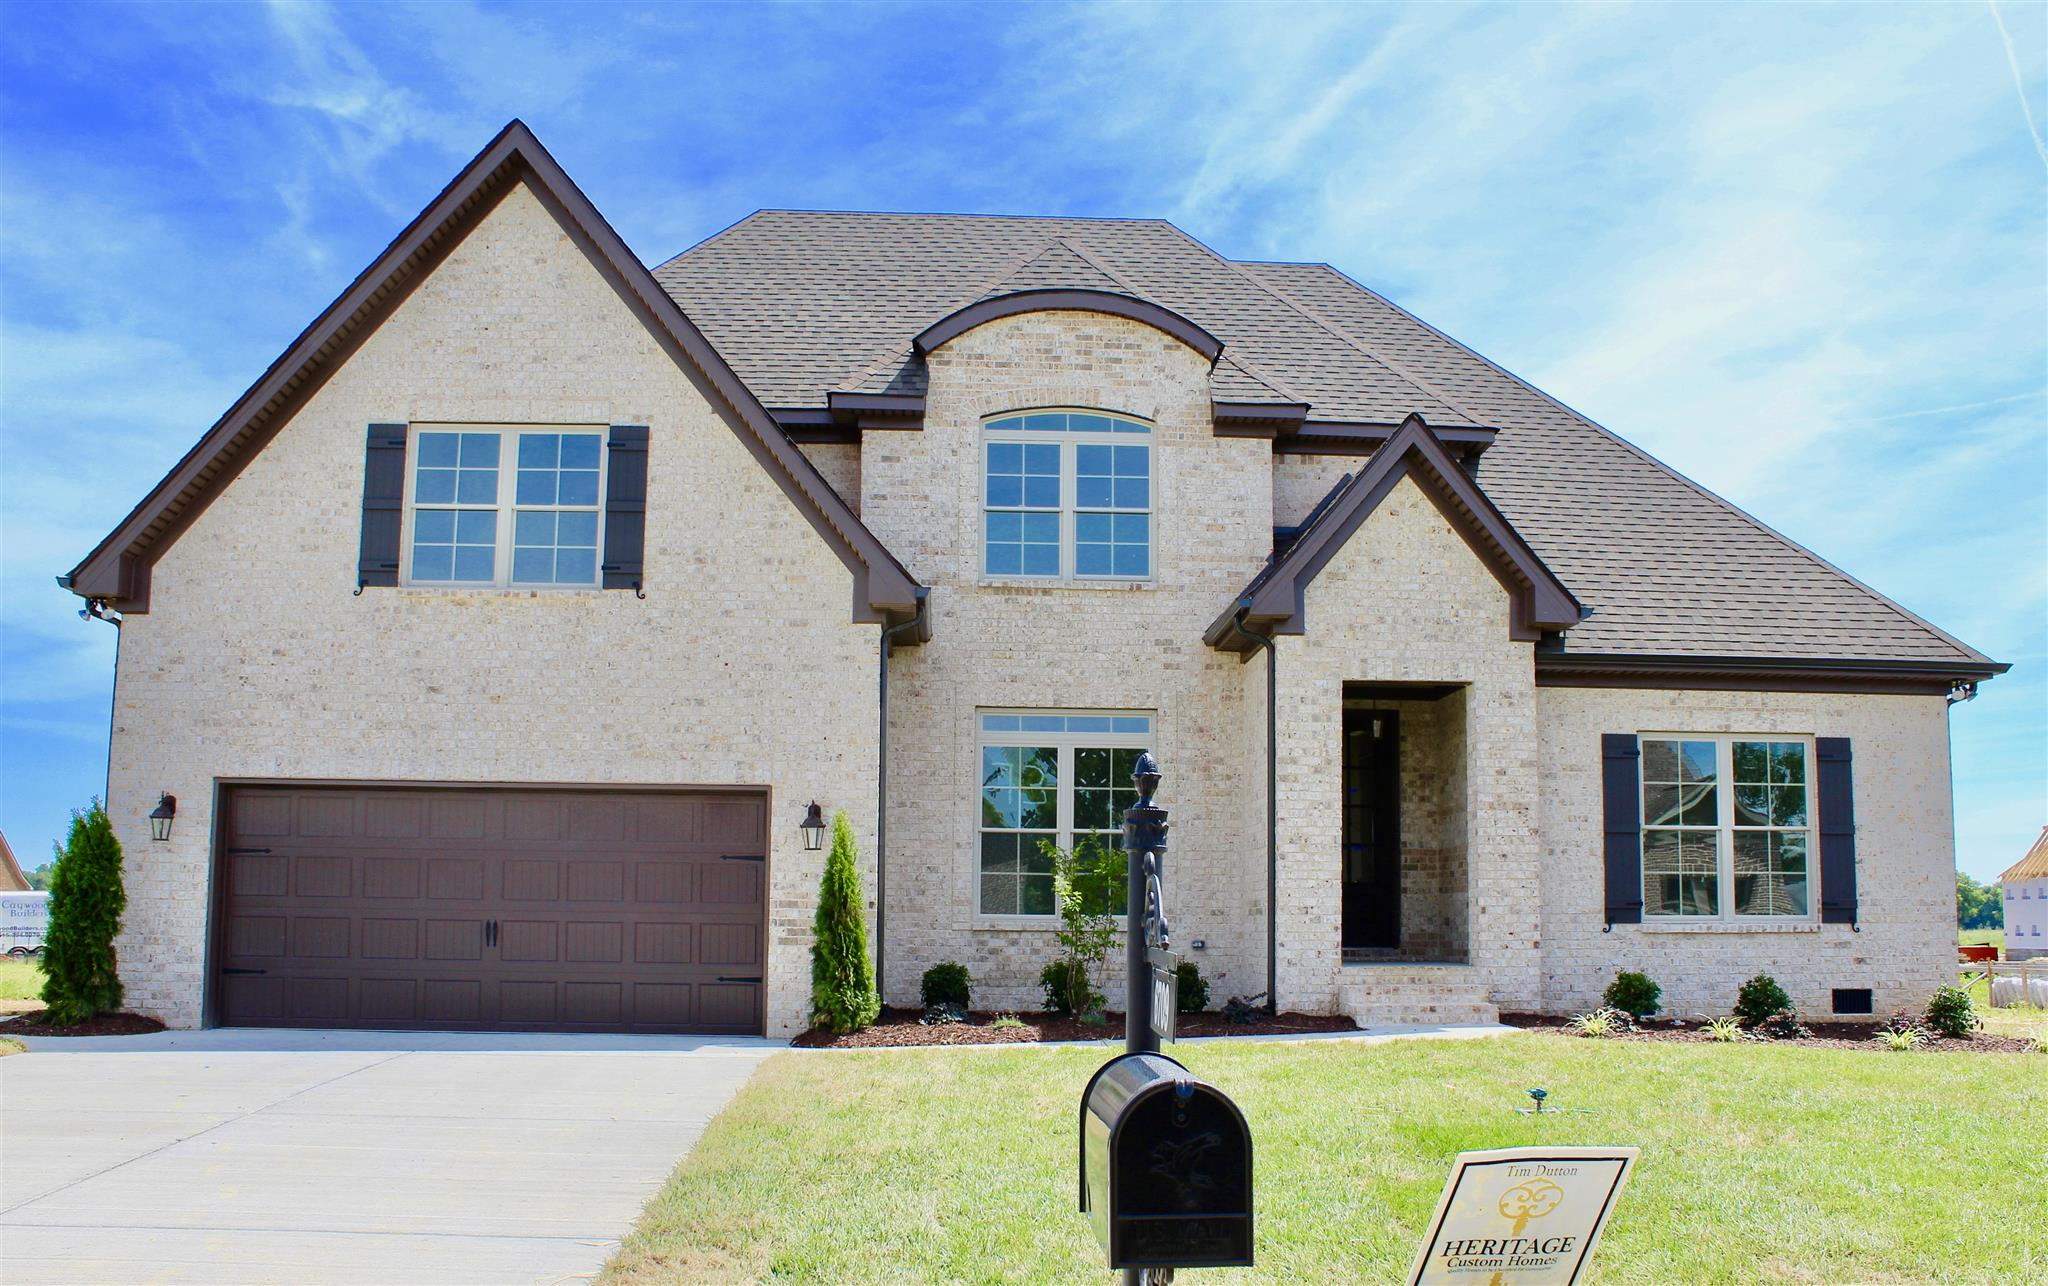 5709 Iverson Drive (Lot 73), Murfreesboro, TN 37127